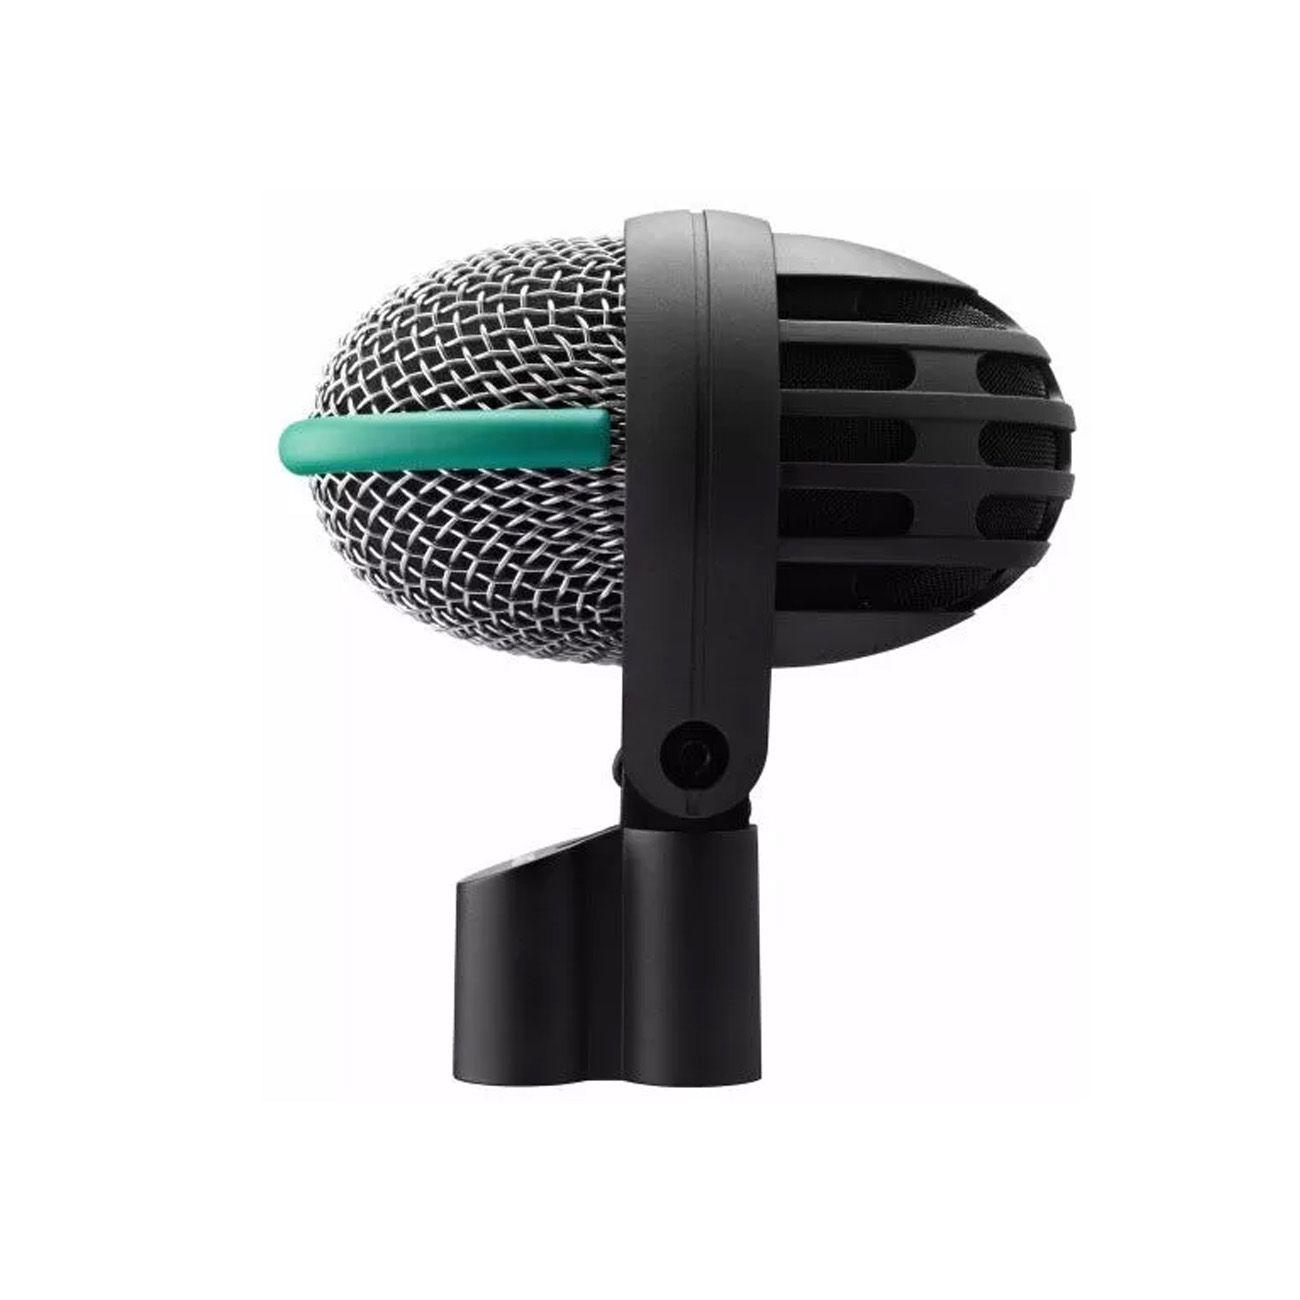 Microfone Dinâmico Akg D112 Mkii Para Bumbo E Percussão-